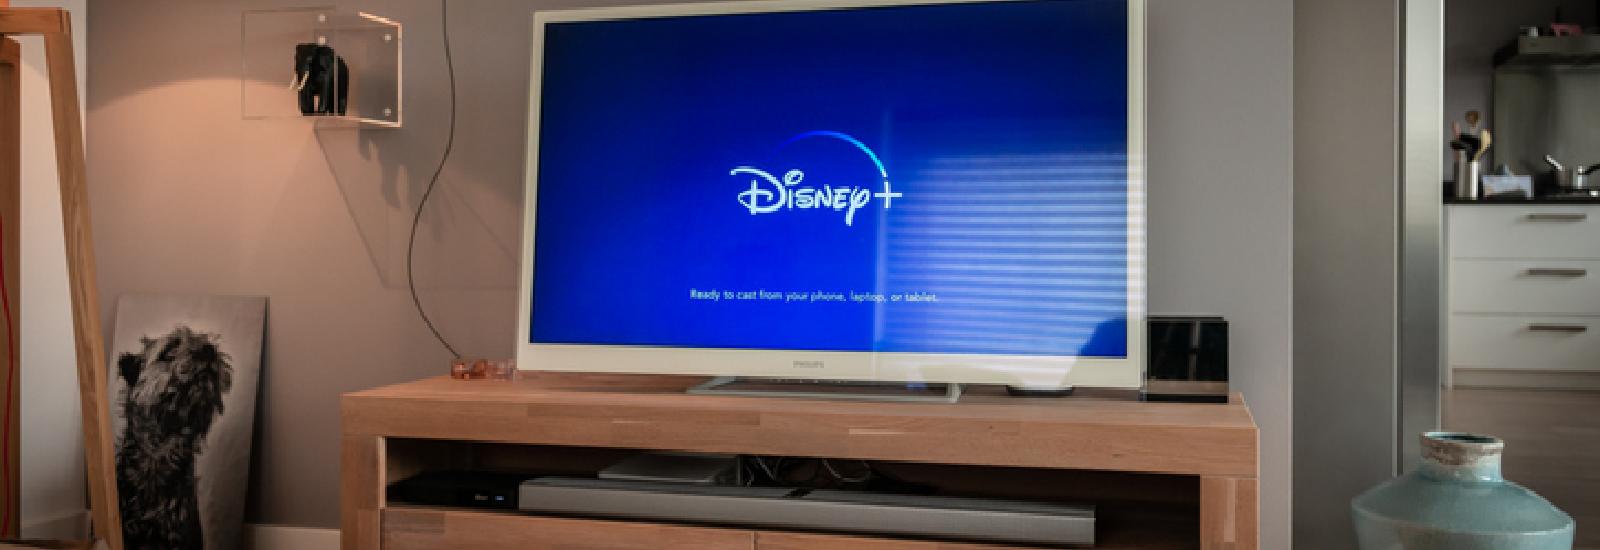 Military Movies on Disney+